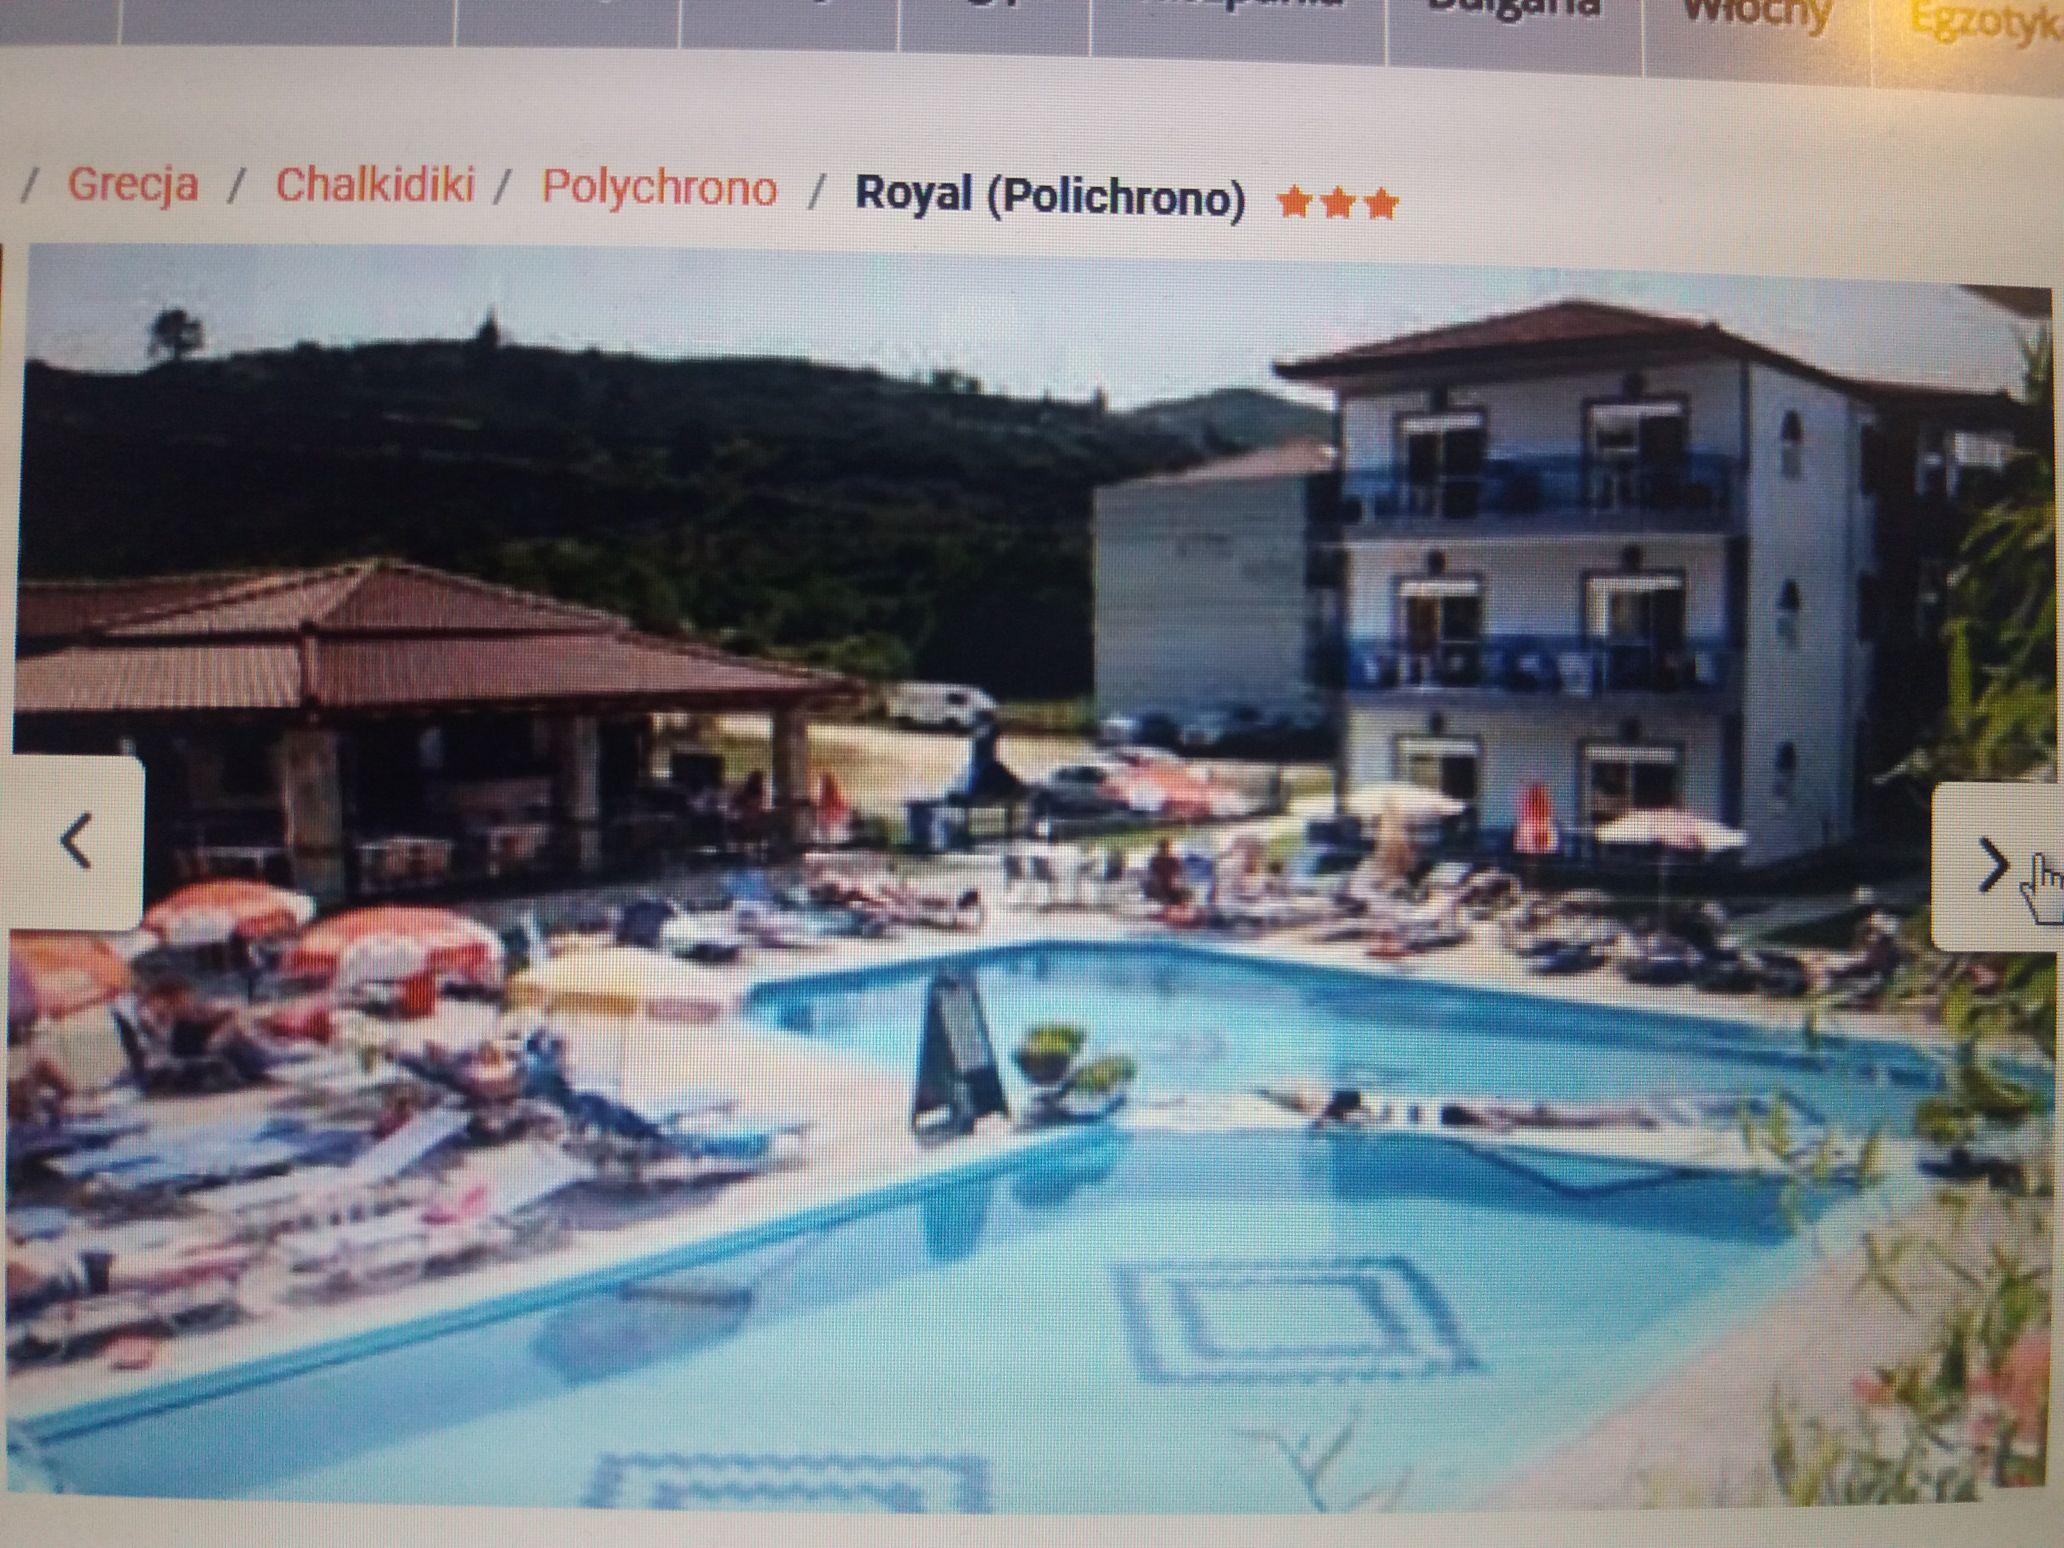 Grecja Chalkidiki 7 dni all incl. Hotel z b. dobrymi ocenami